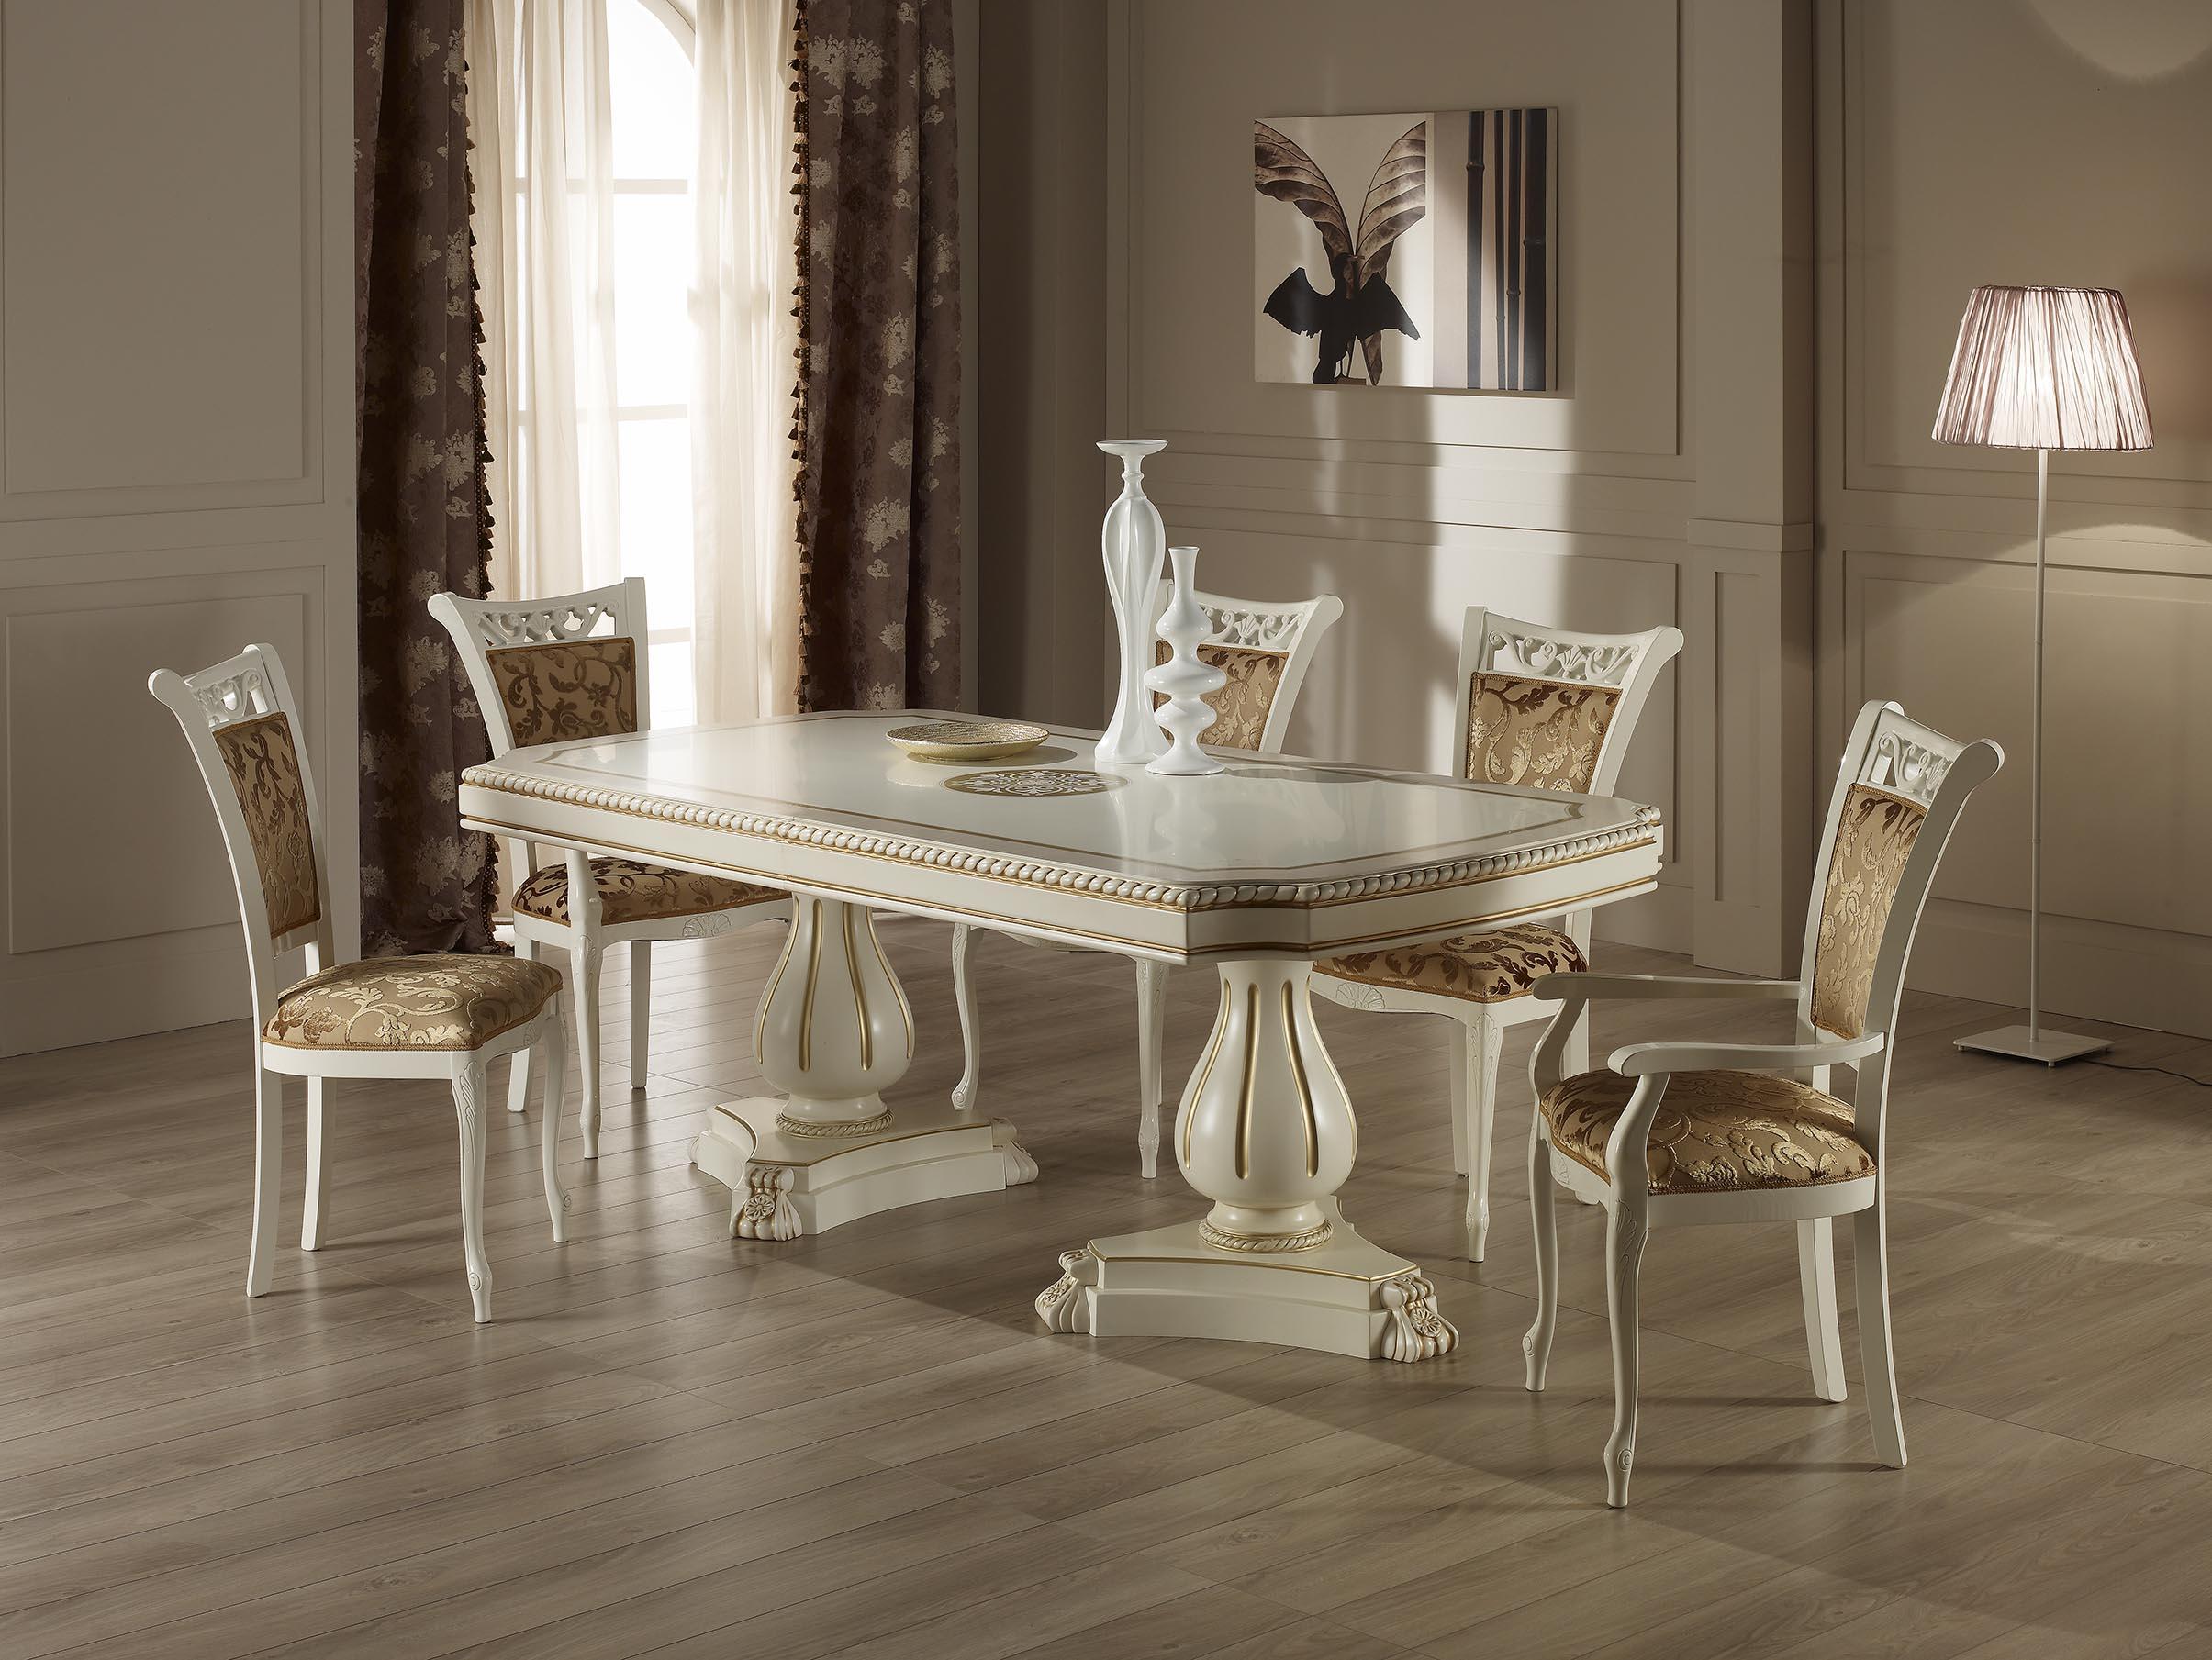 Обеденный стол Коринто (2010*450мм + 450мм*1045*760мм)